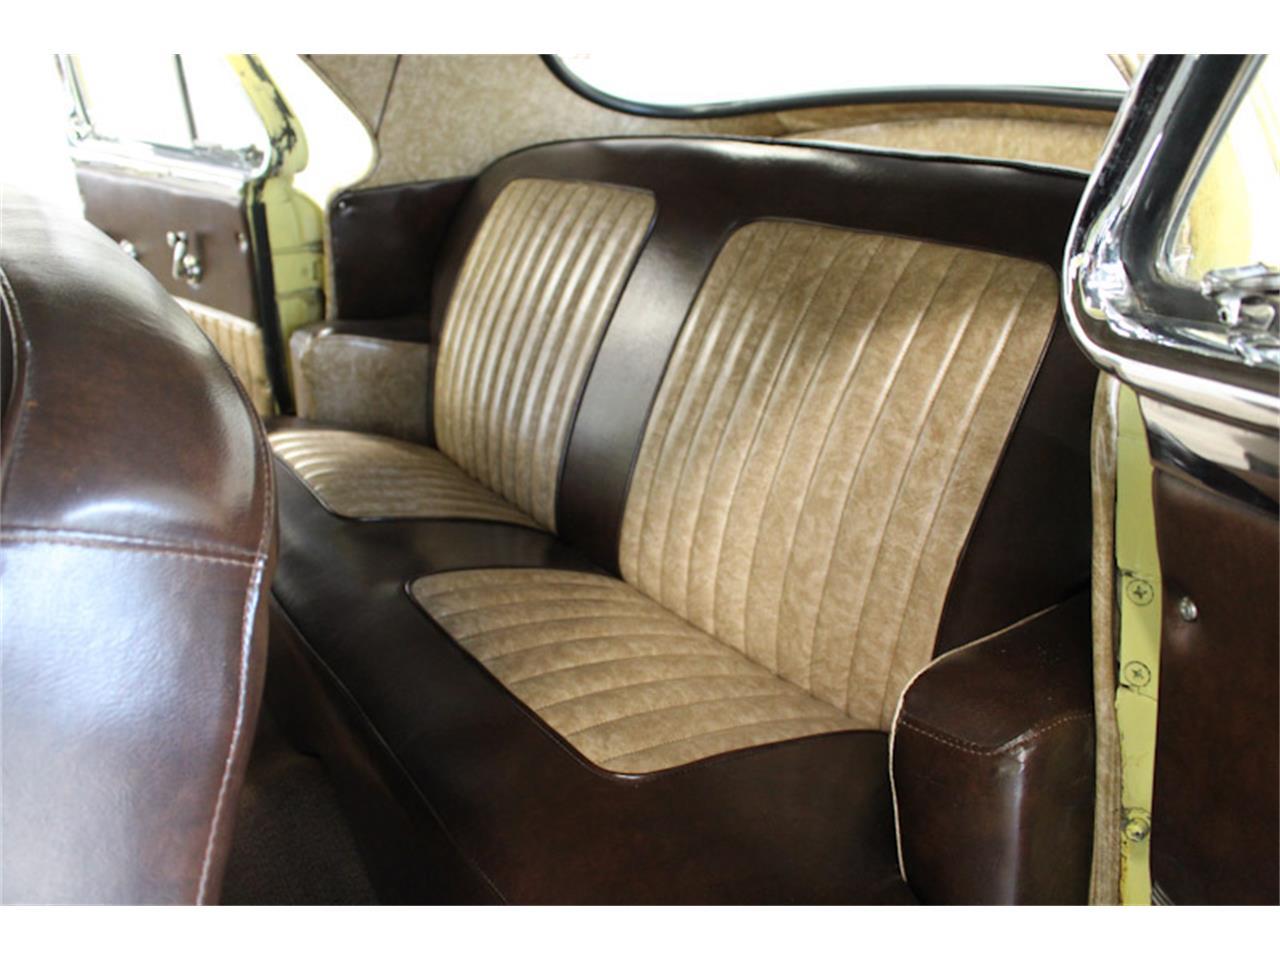 Large Picture of Classic 1950 Mercury Hot Rod located in Fairfield California - $29,990.00 - OJFQ